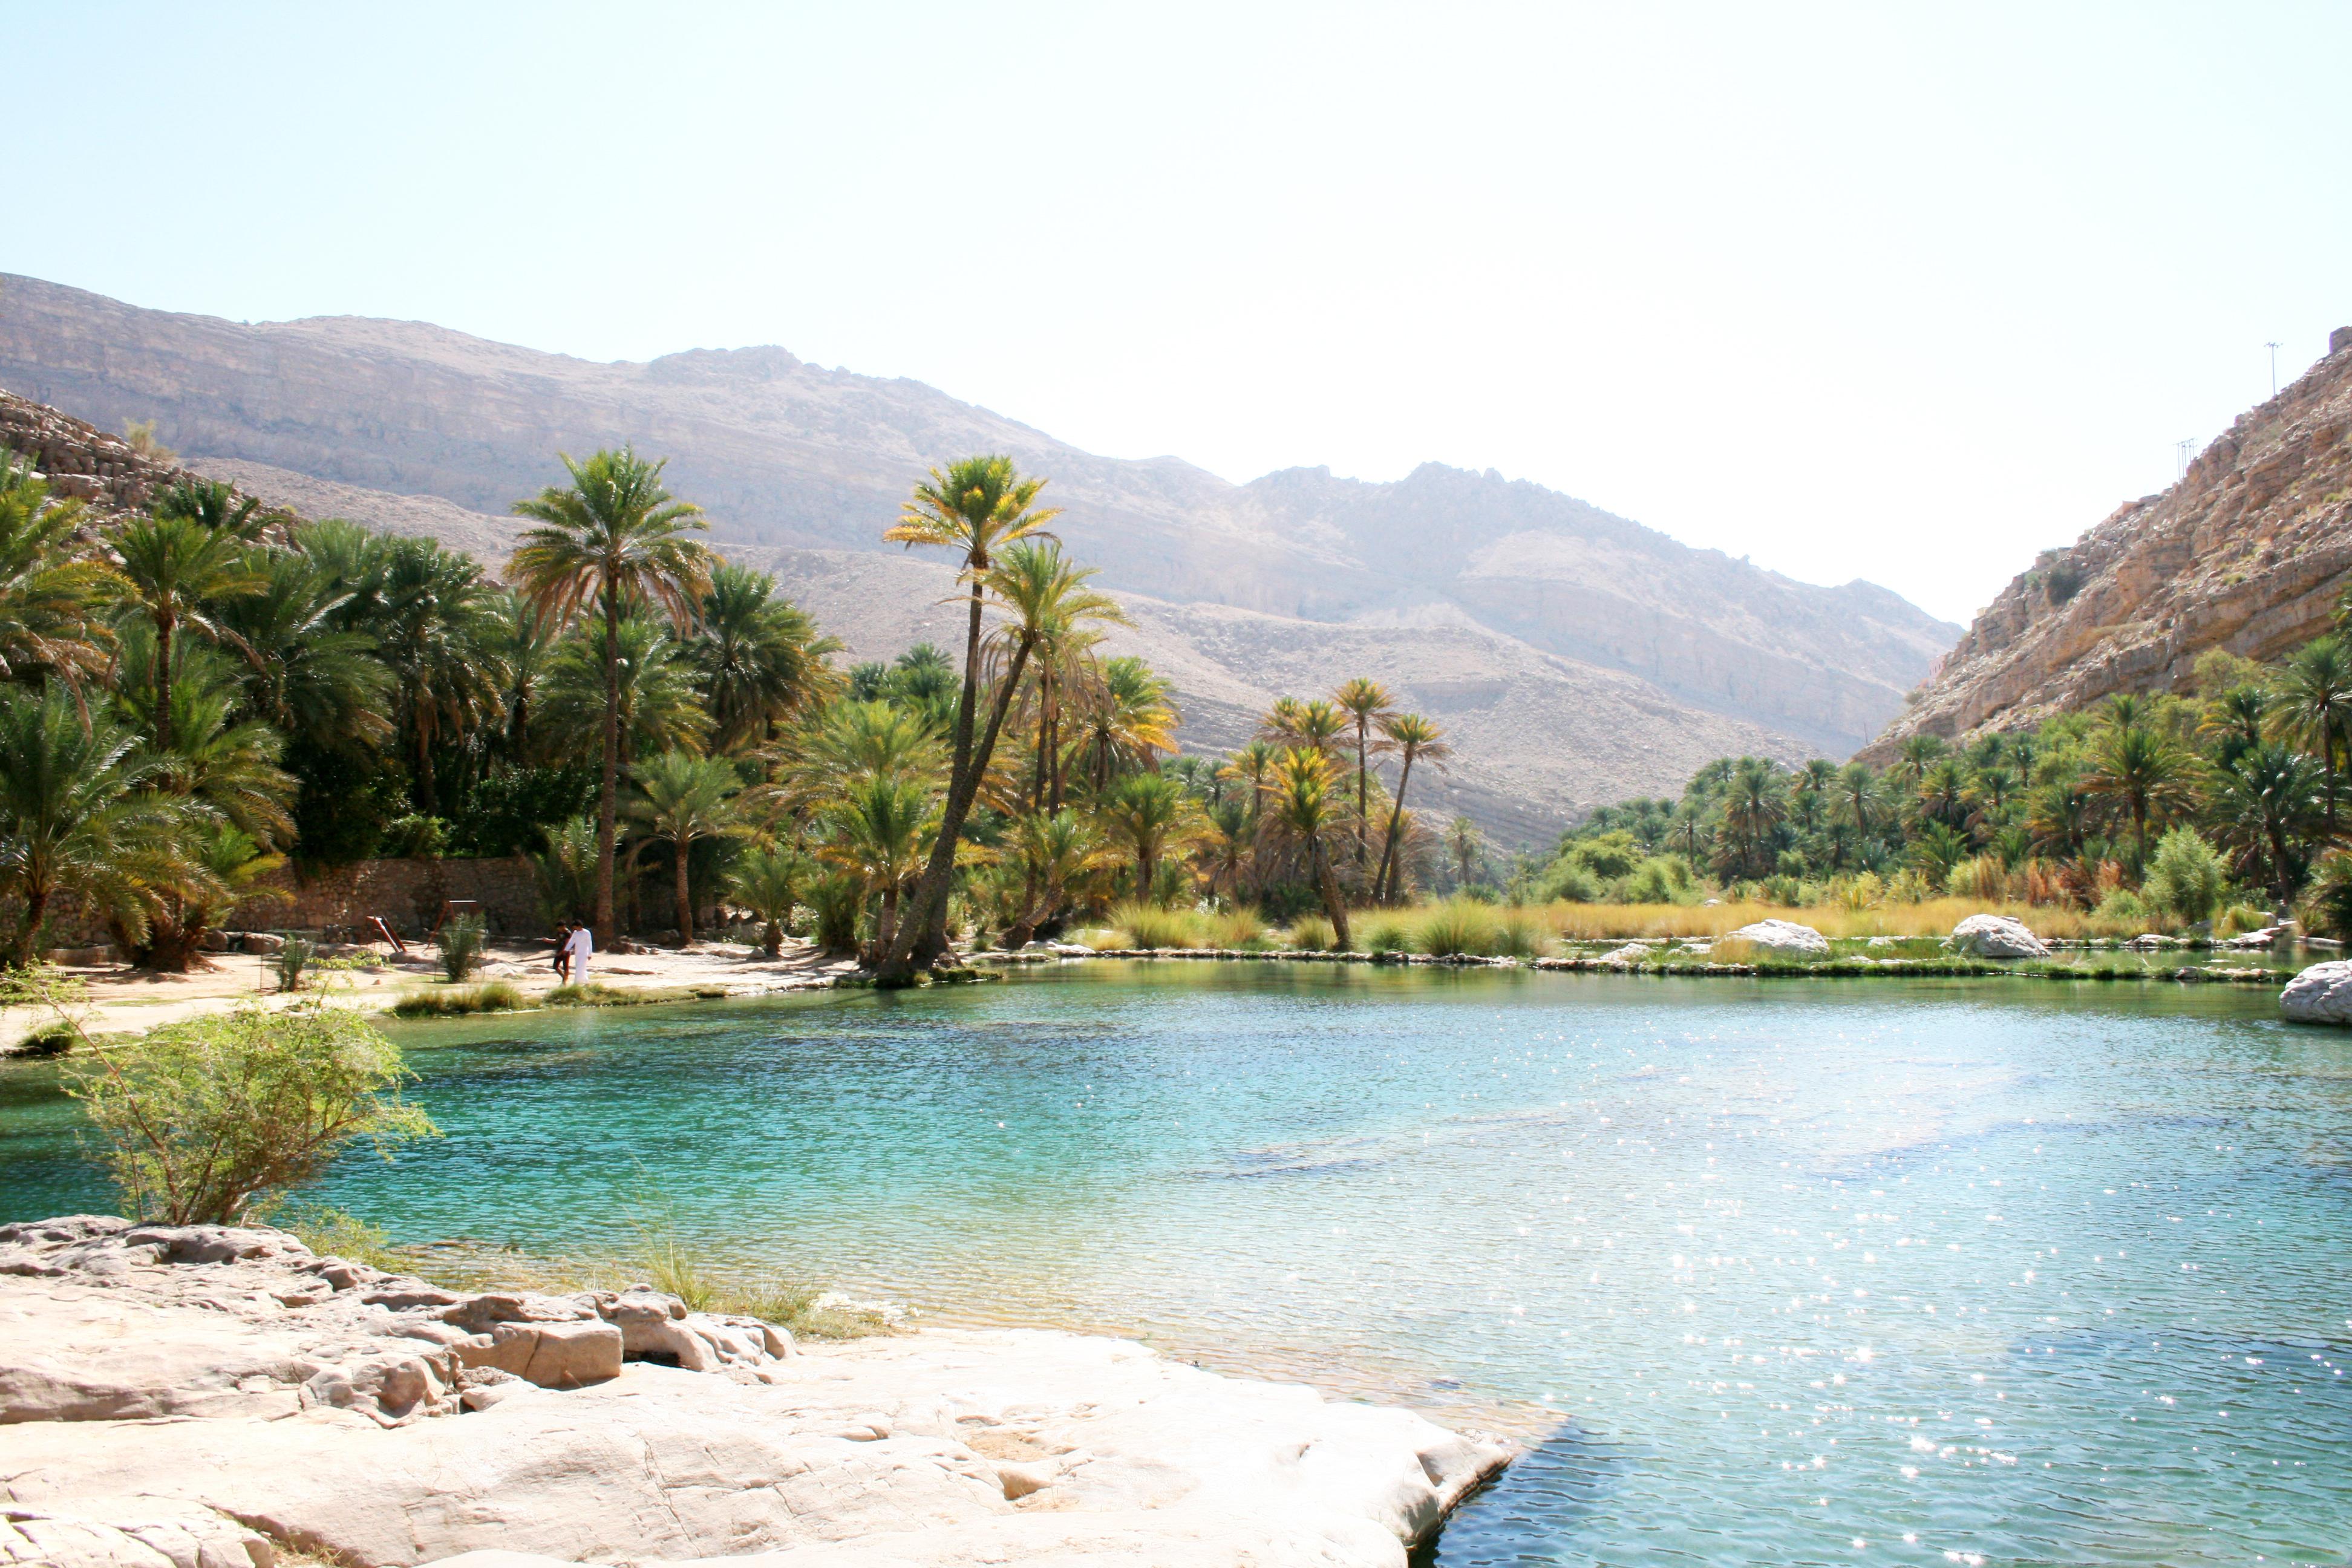 desert lake oasis